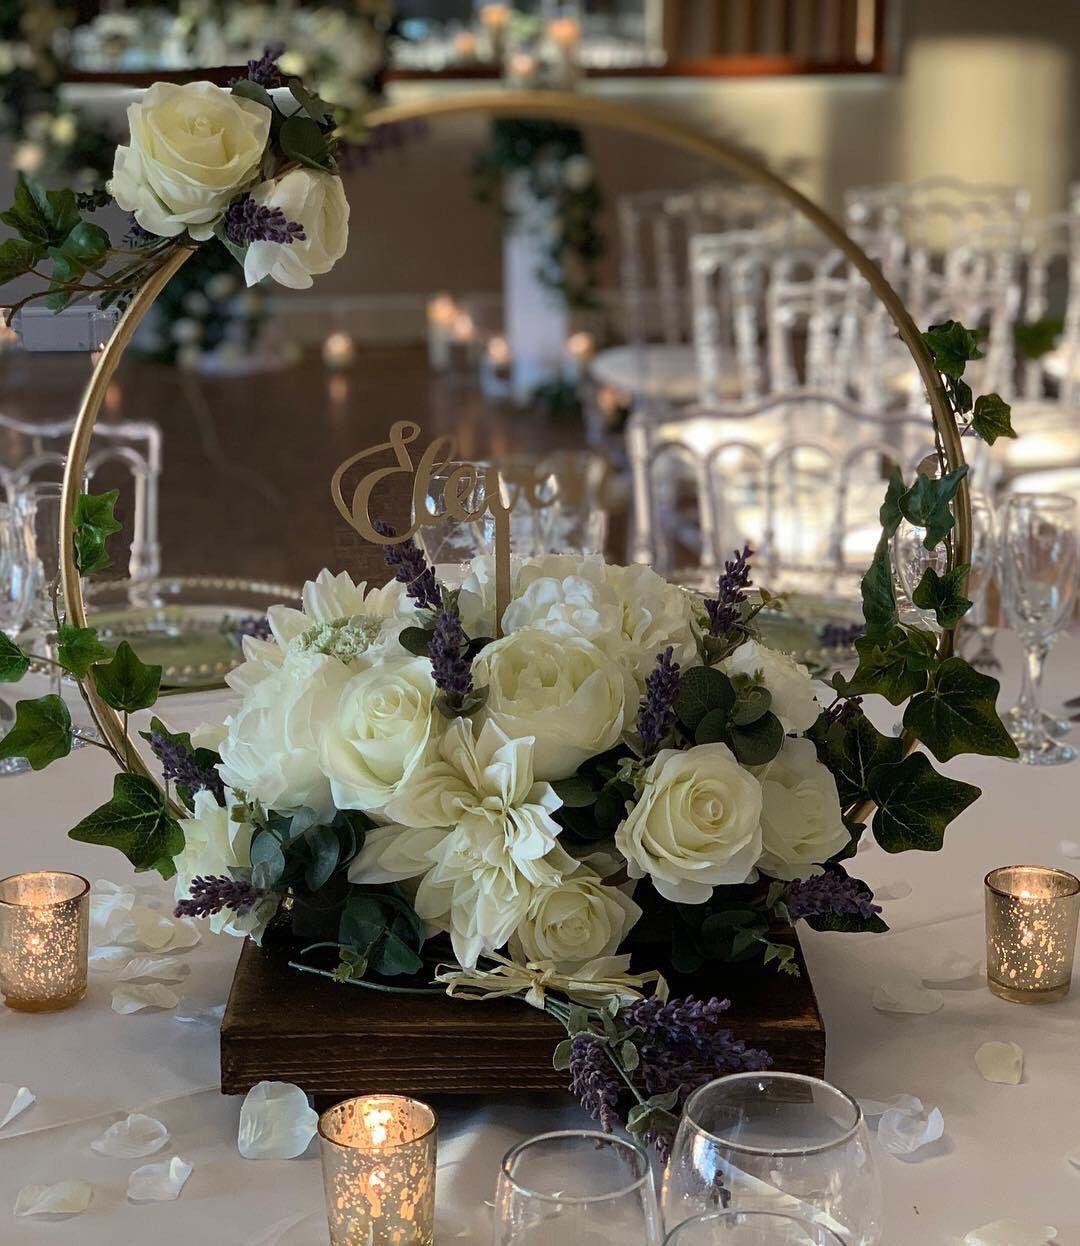 Wedding Chapel Decoration Ideas: Hoop Centre Piece. Ideal For DIY Brides, Florists And